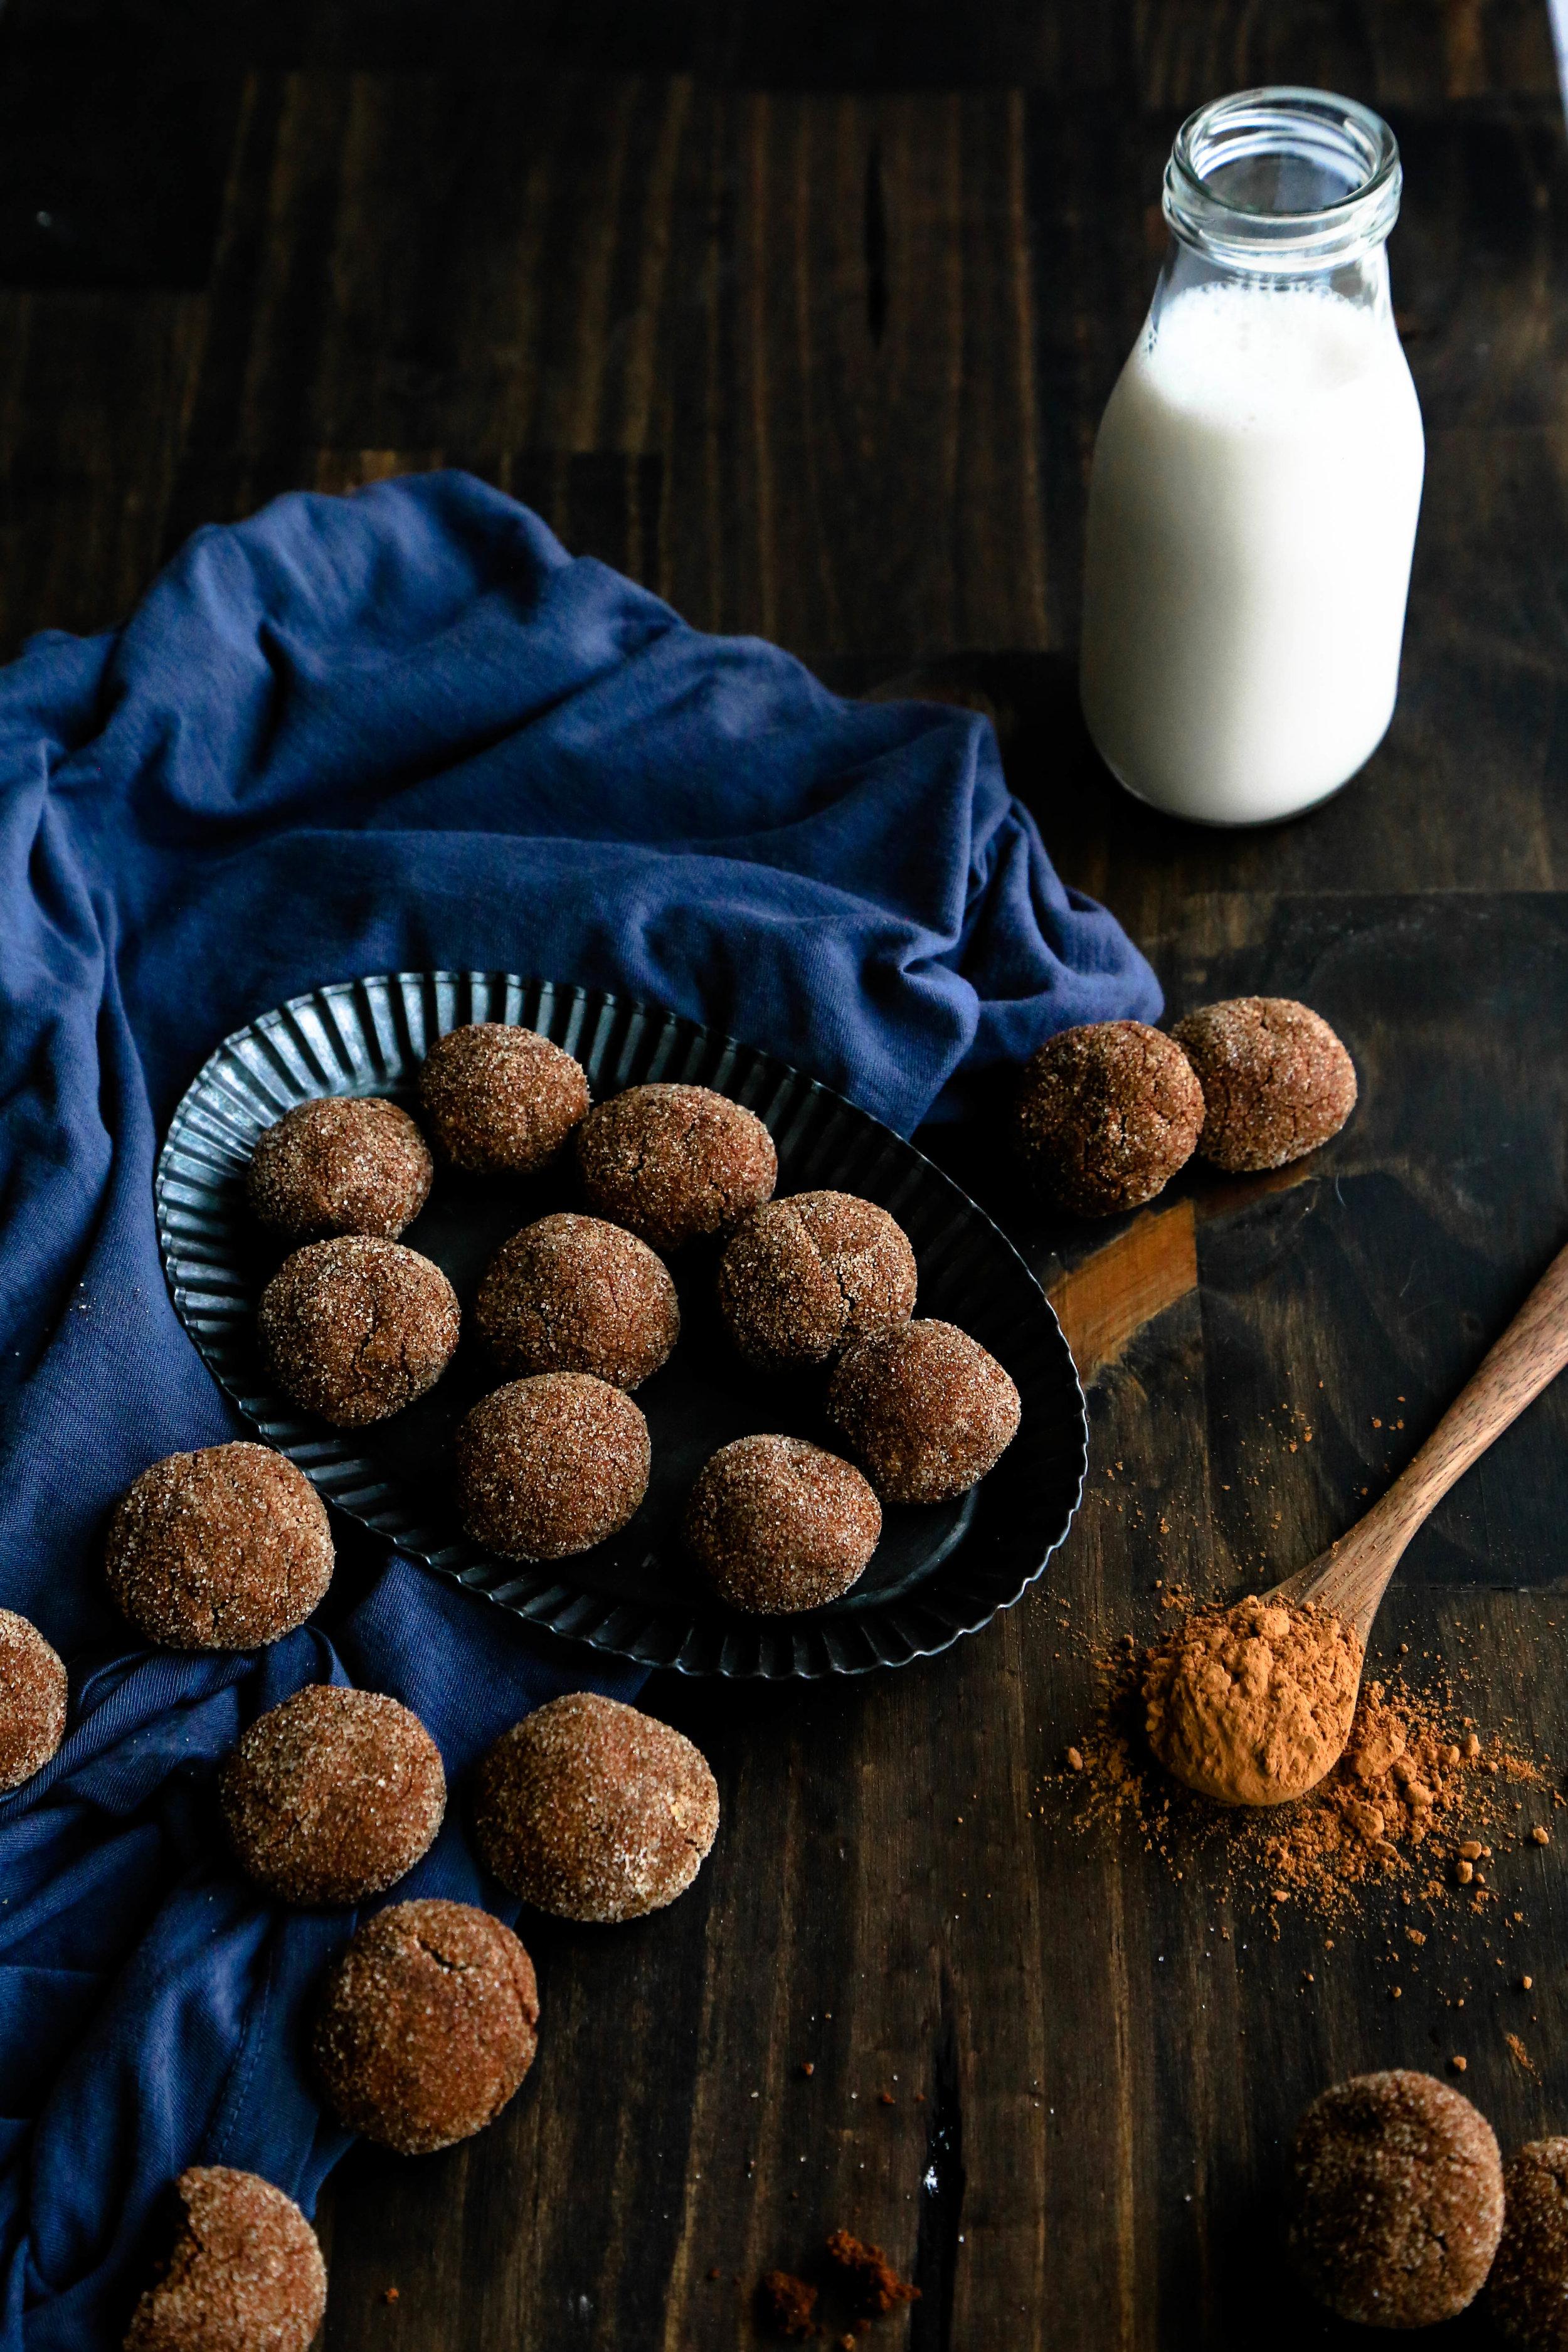 gluten free & vegan chocolate snickerdoodles